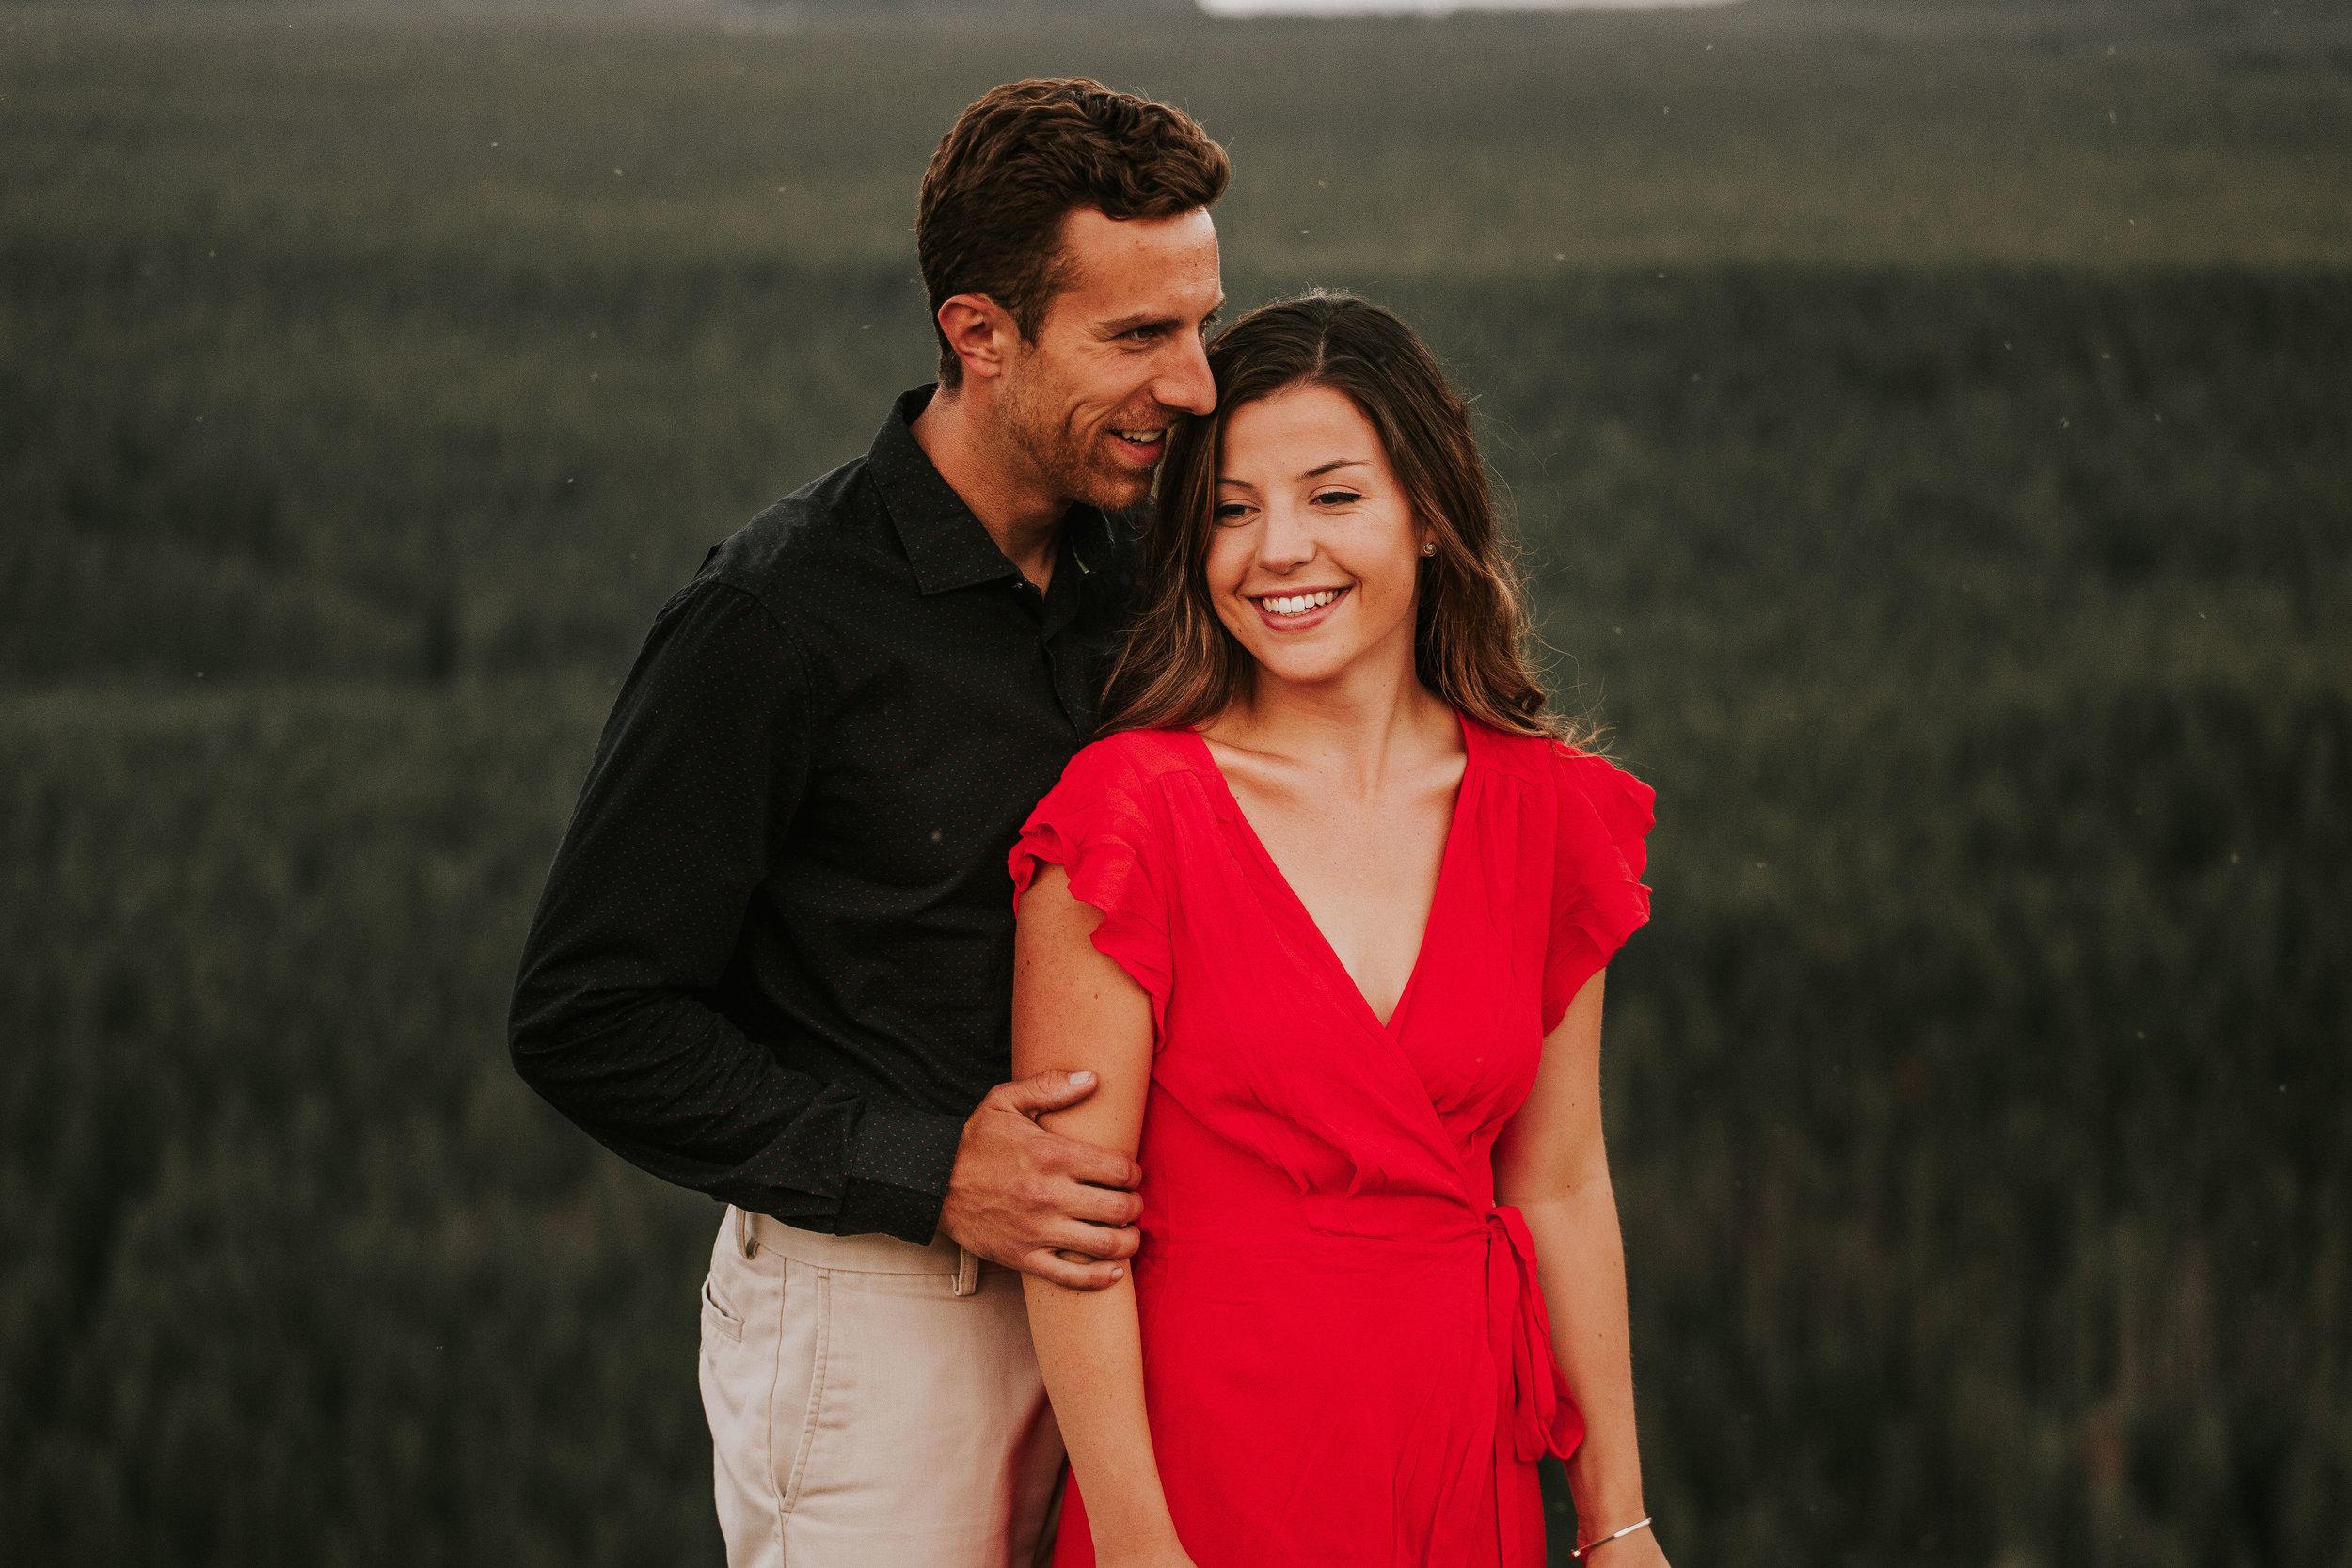 nicole-daacke-photography-rattlesnake-ridge-adventurous-engagement-session-hiking-seattle-washington-destinatino-elopement-intimate-wedding-photographer-11.jpg